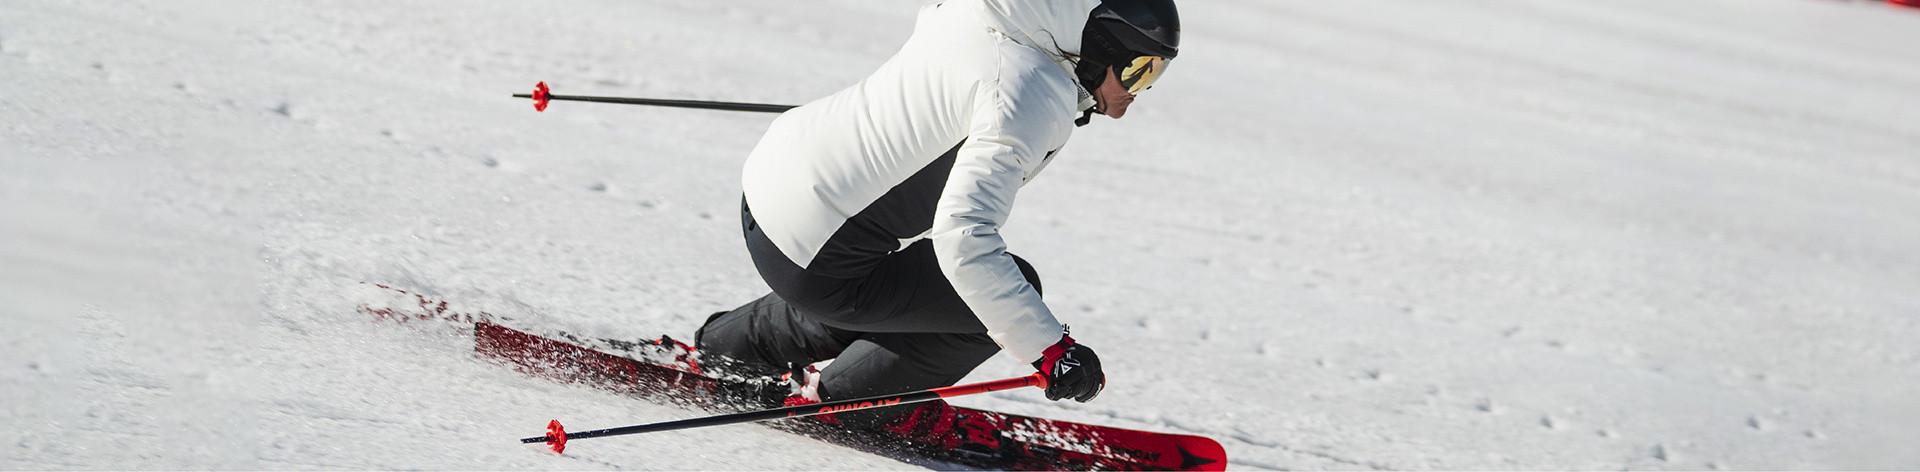 Dainese Winter Sports woman Jackets